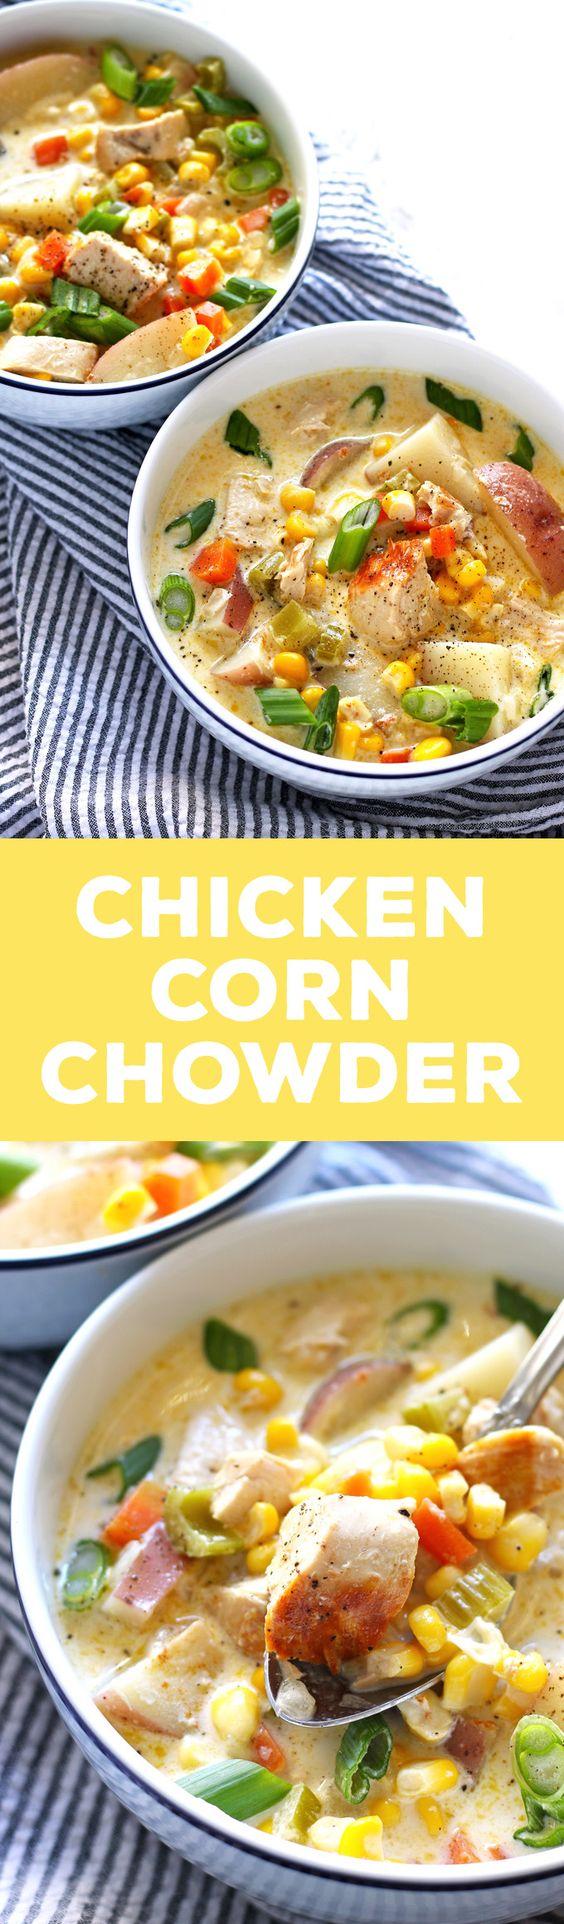 Corn Chowder | Recipe | Chicken Corn Chowder, Corn Chowder and Corn ...